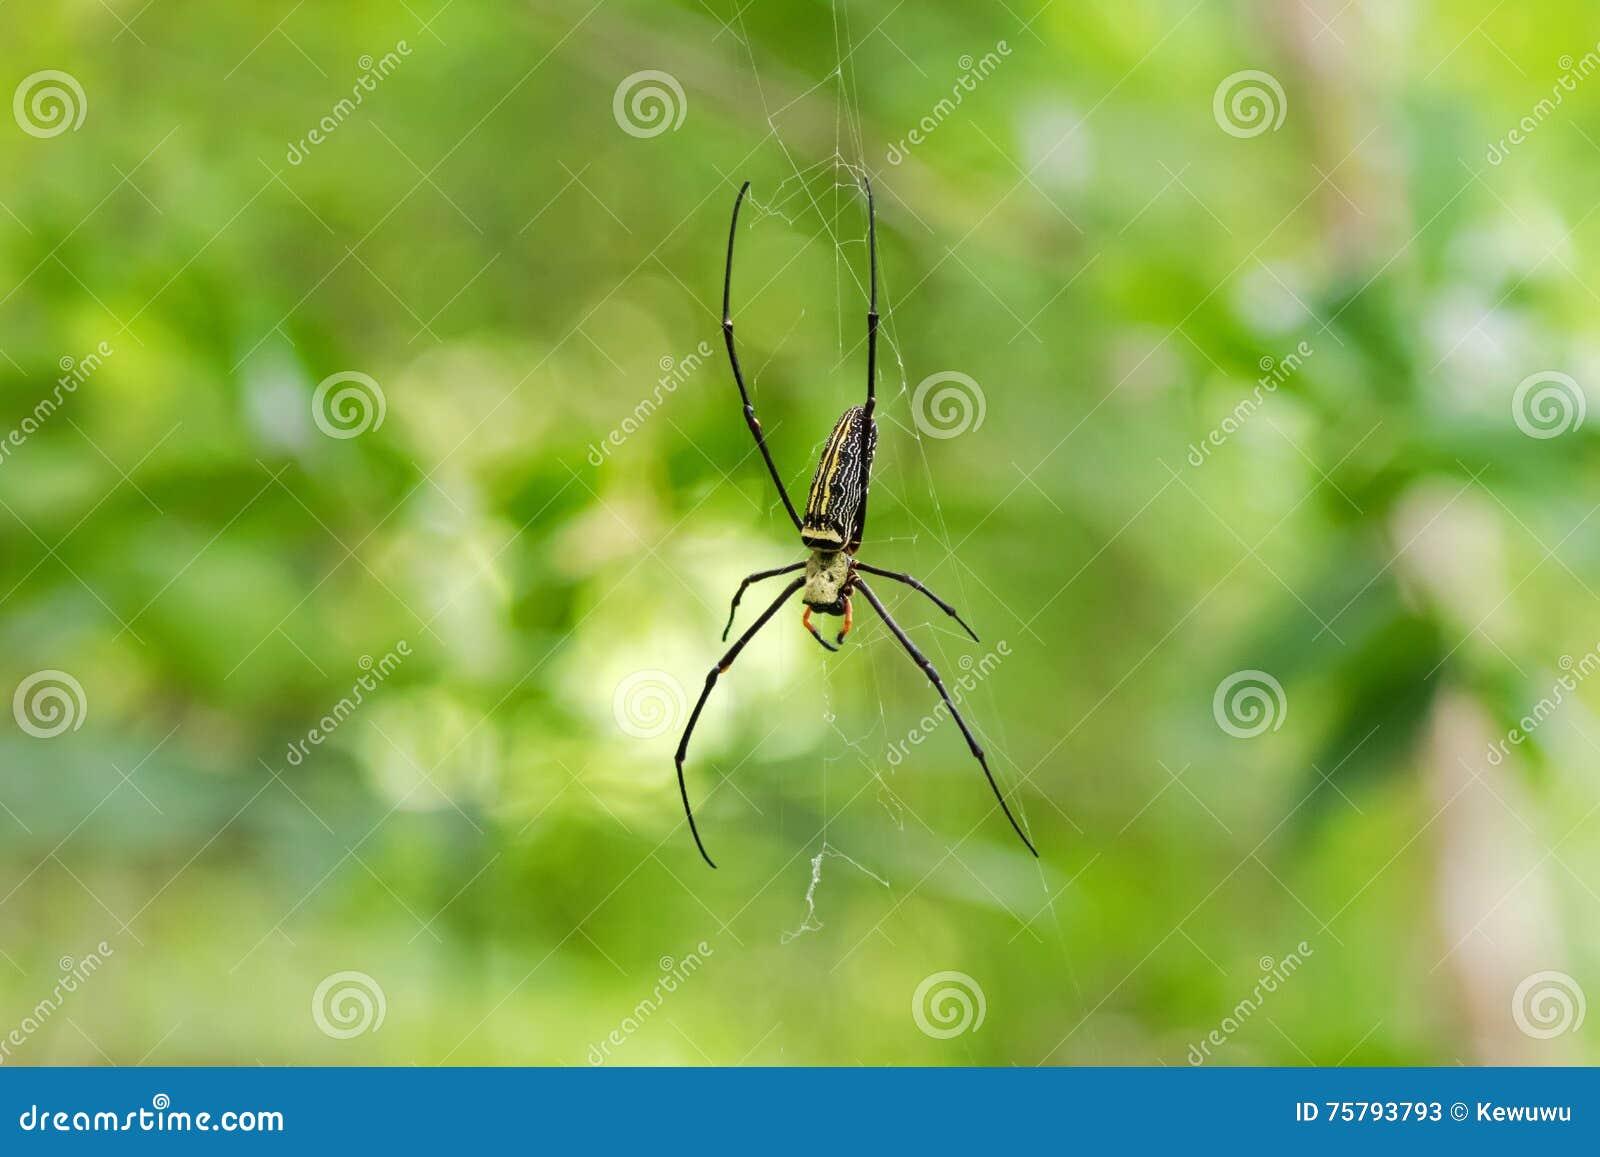 Huge Golden Silk Orb weaver spider hanging from its web